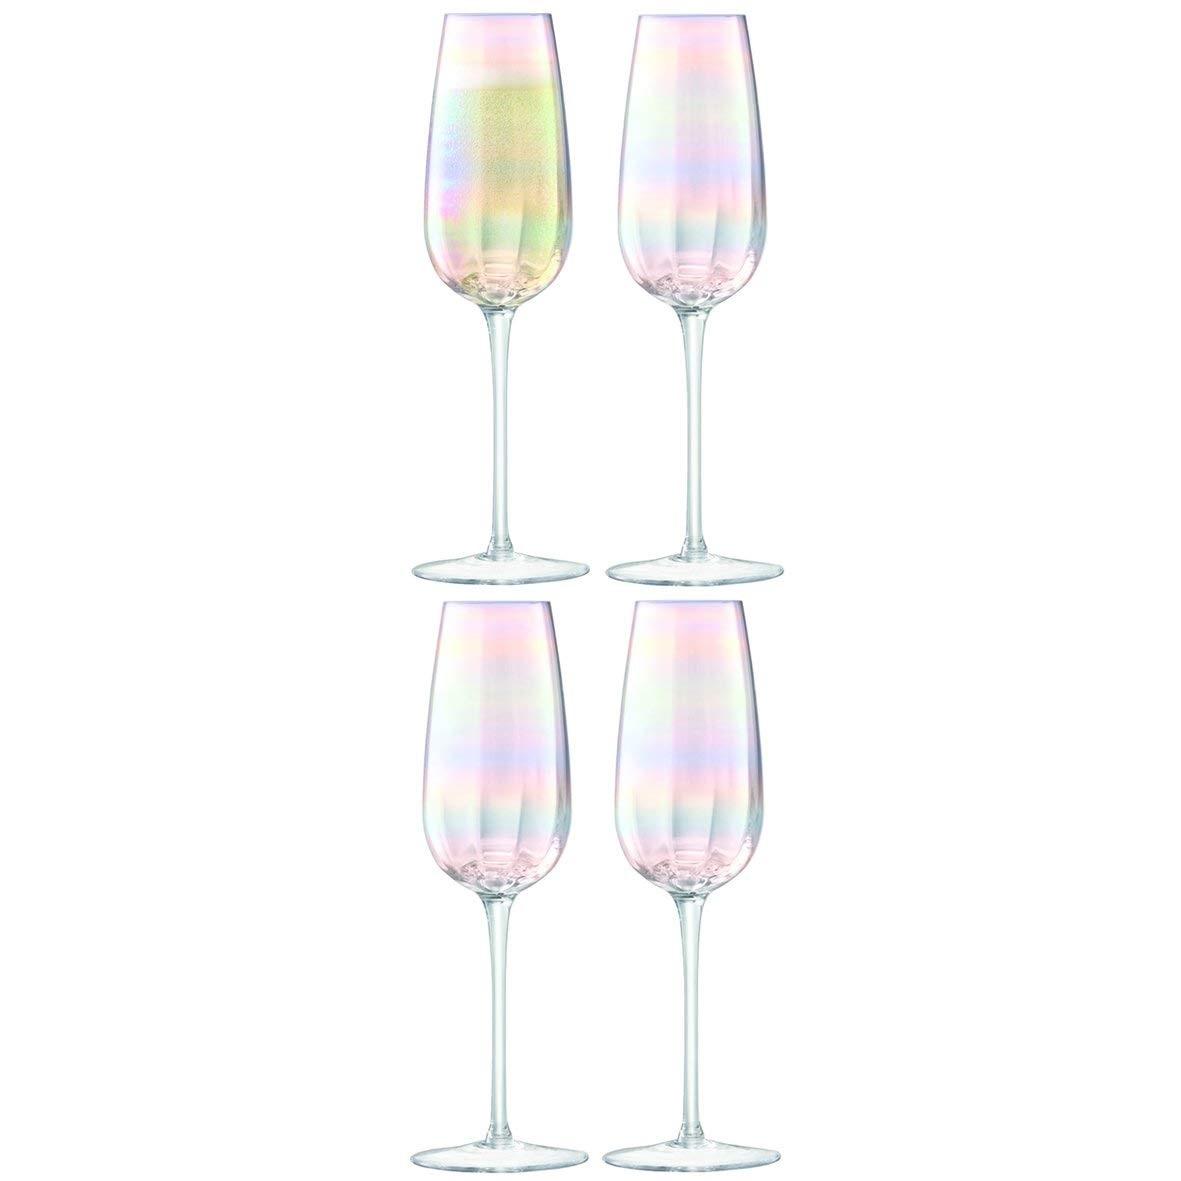 LSA International 珍珠母贝玻璃香槟杯高脚杯 4个装